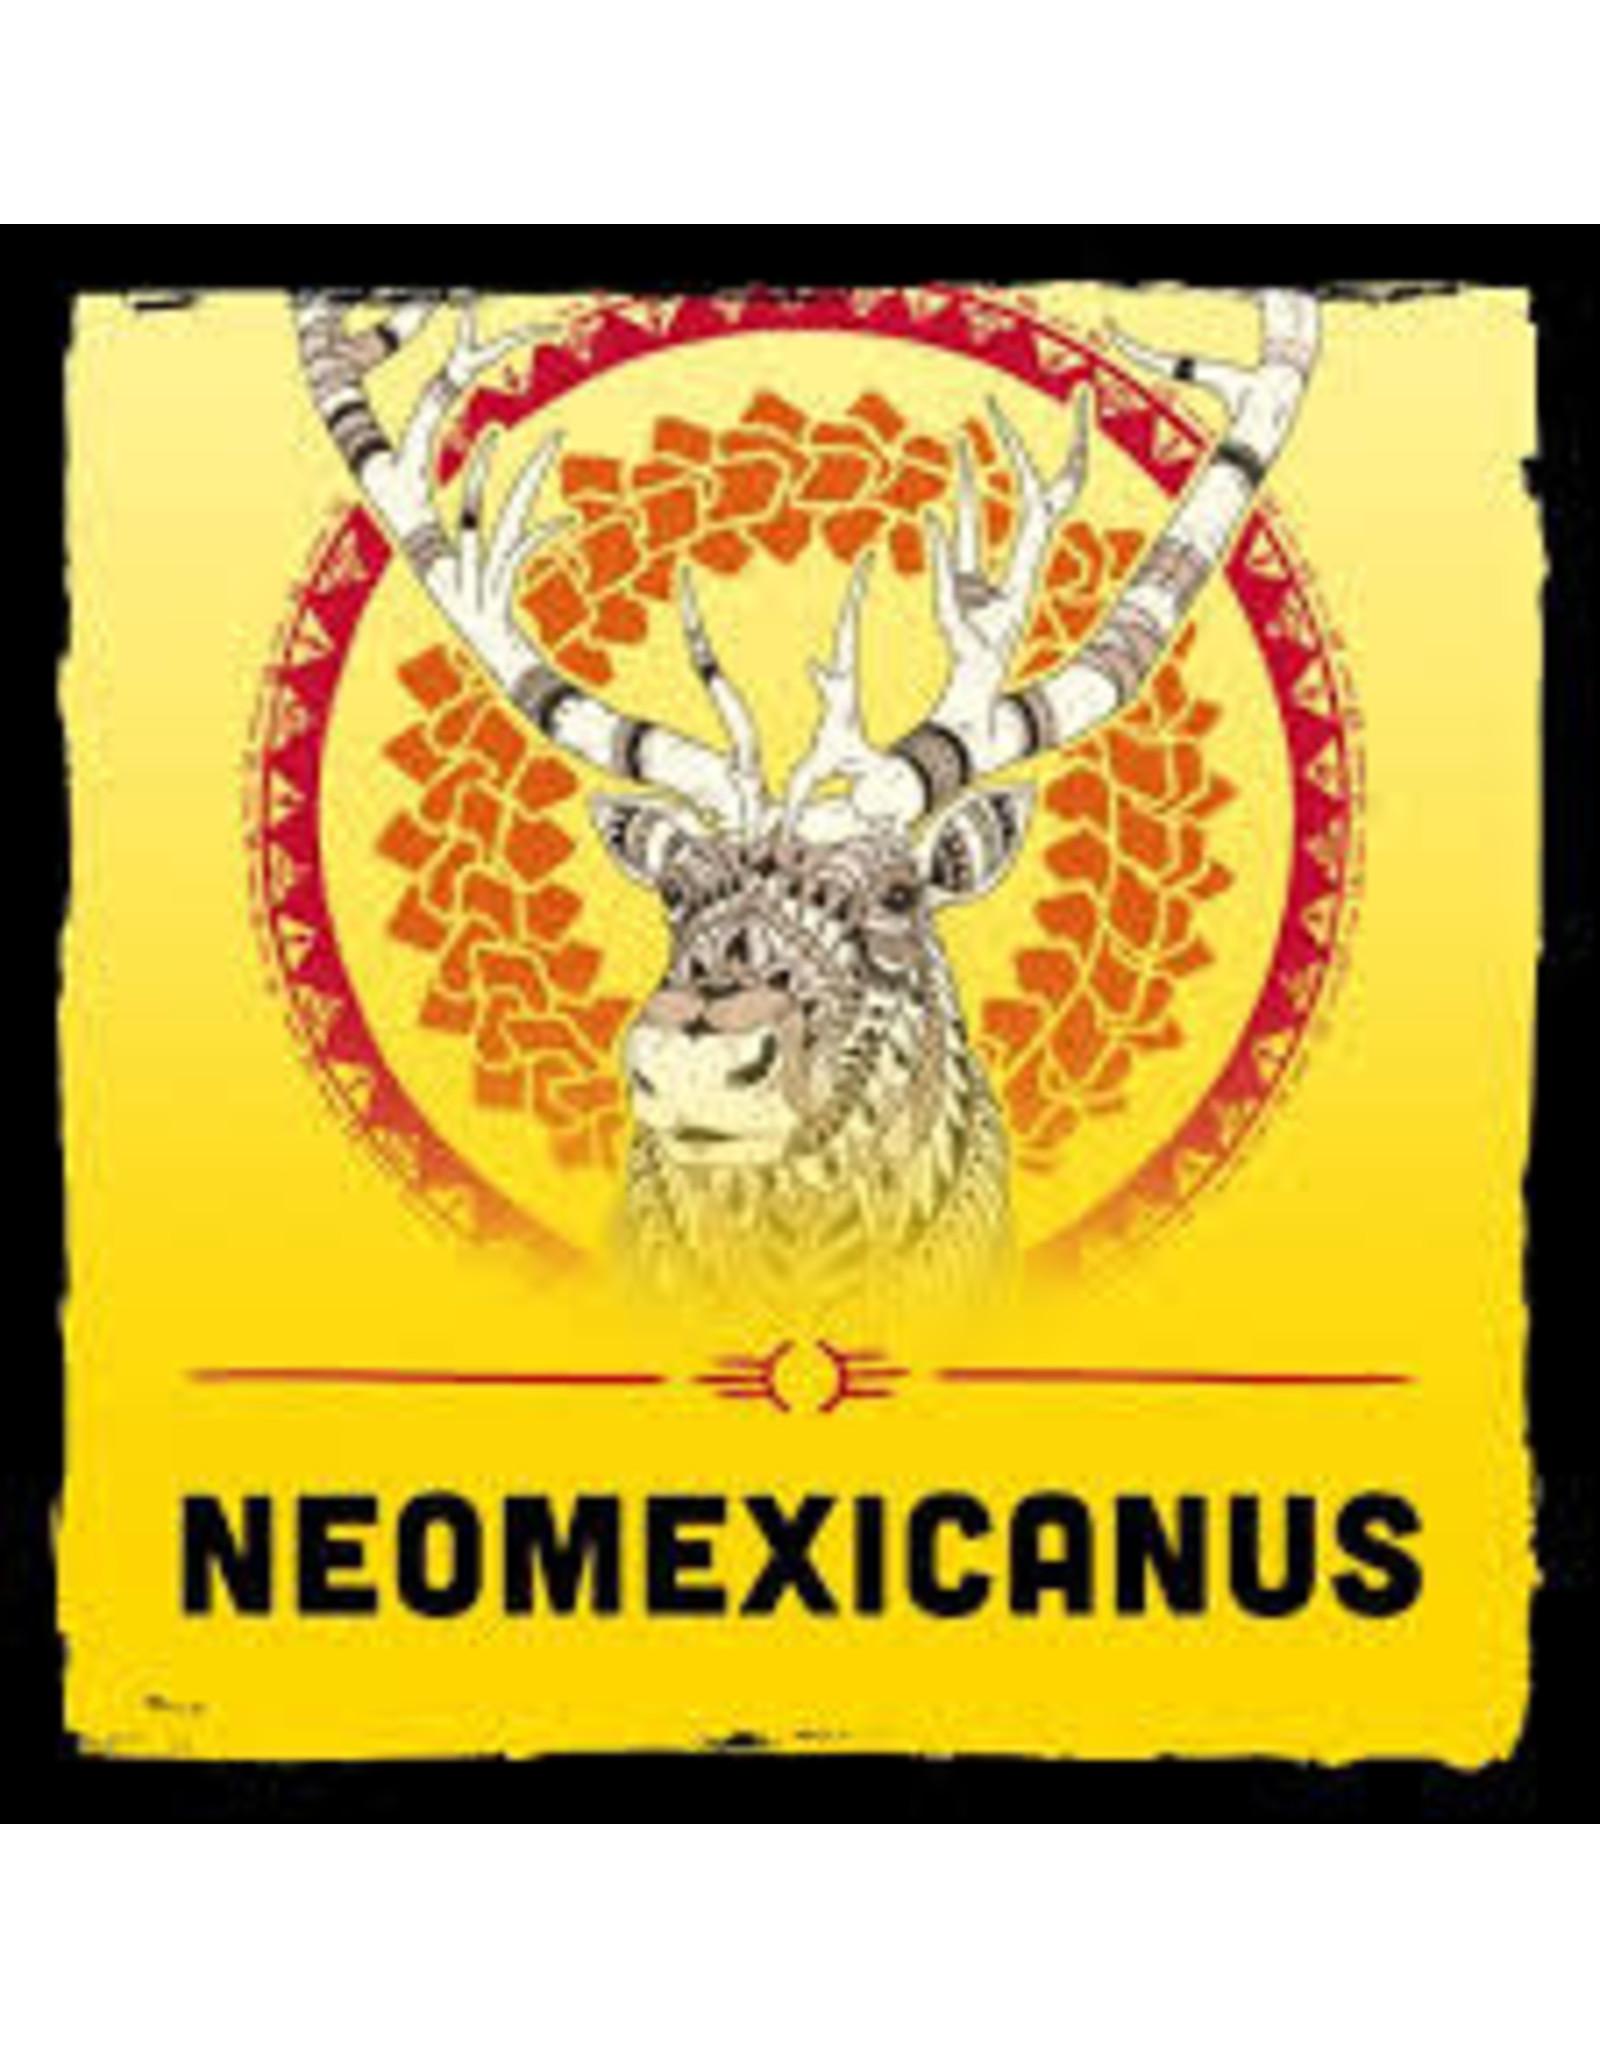 Vasen Vasen Neo Mexicanus 4pk cans